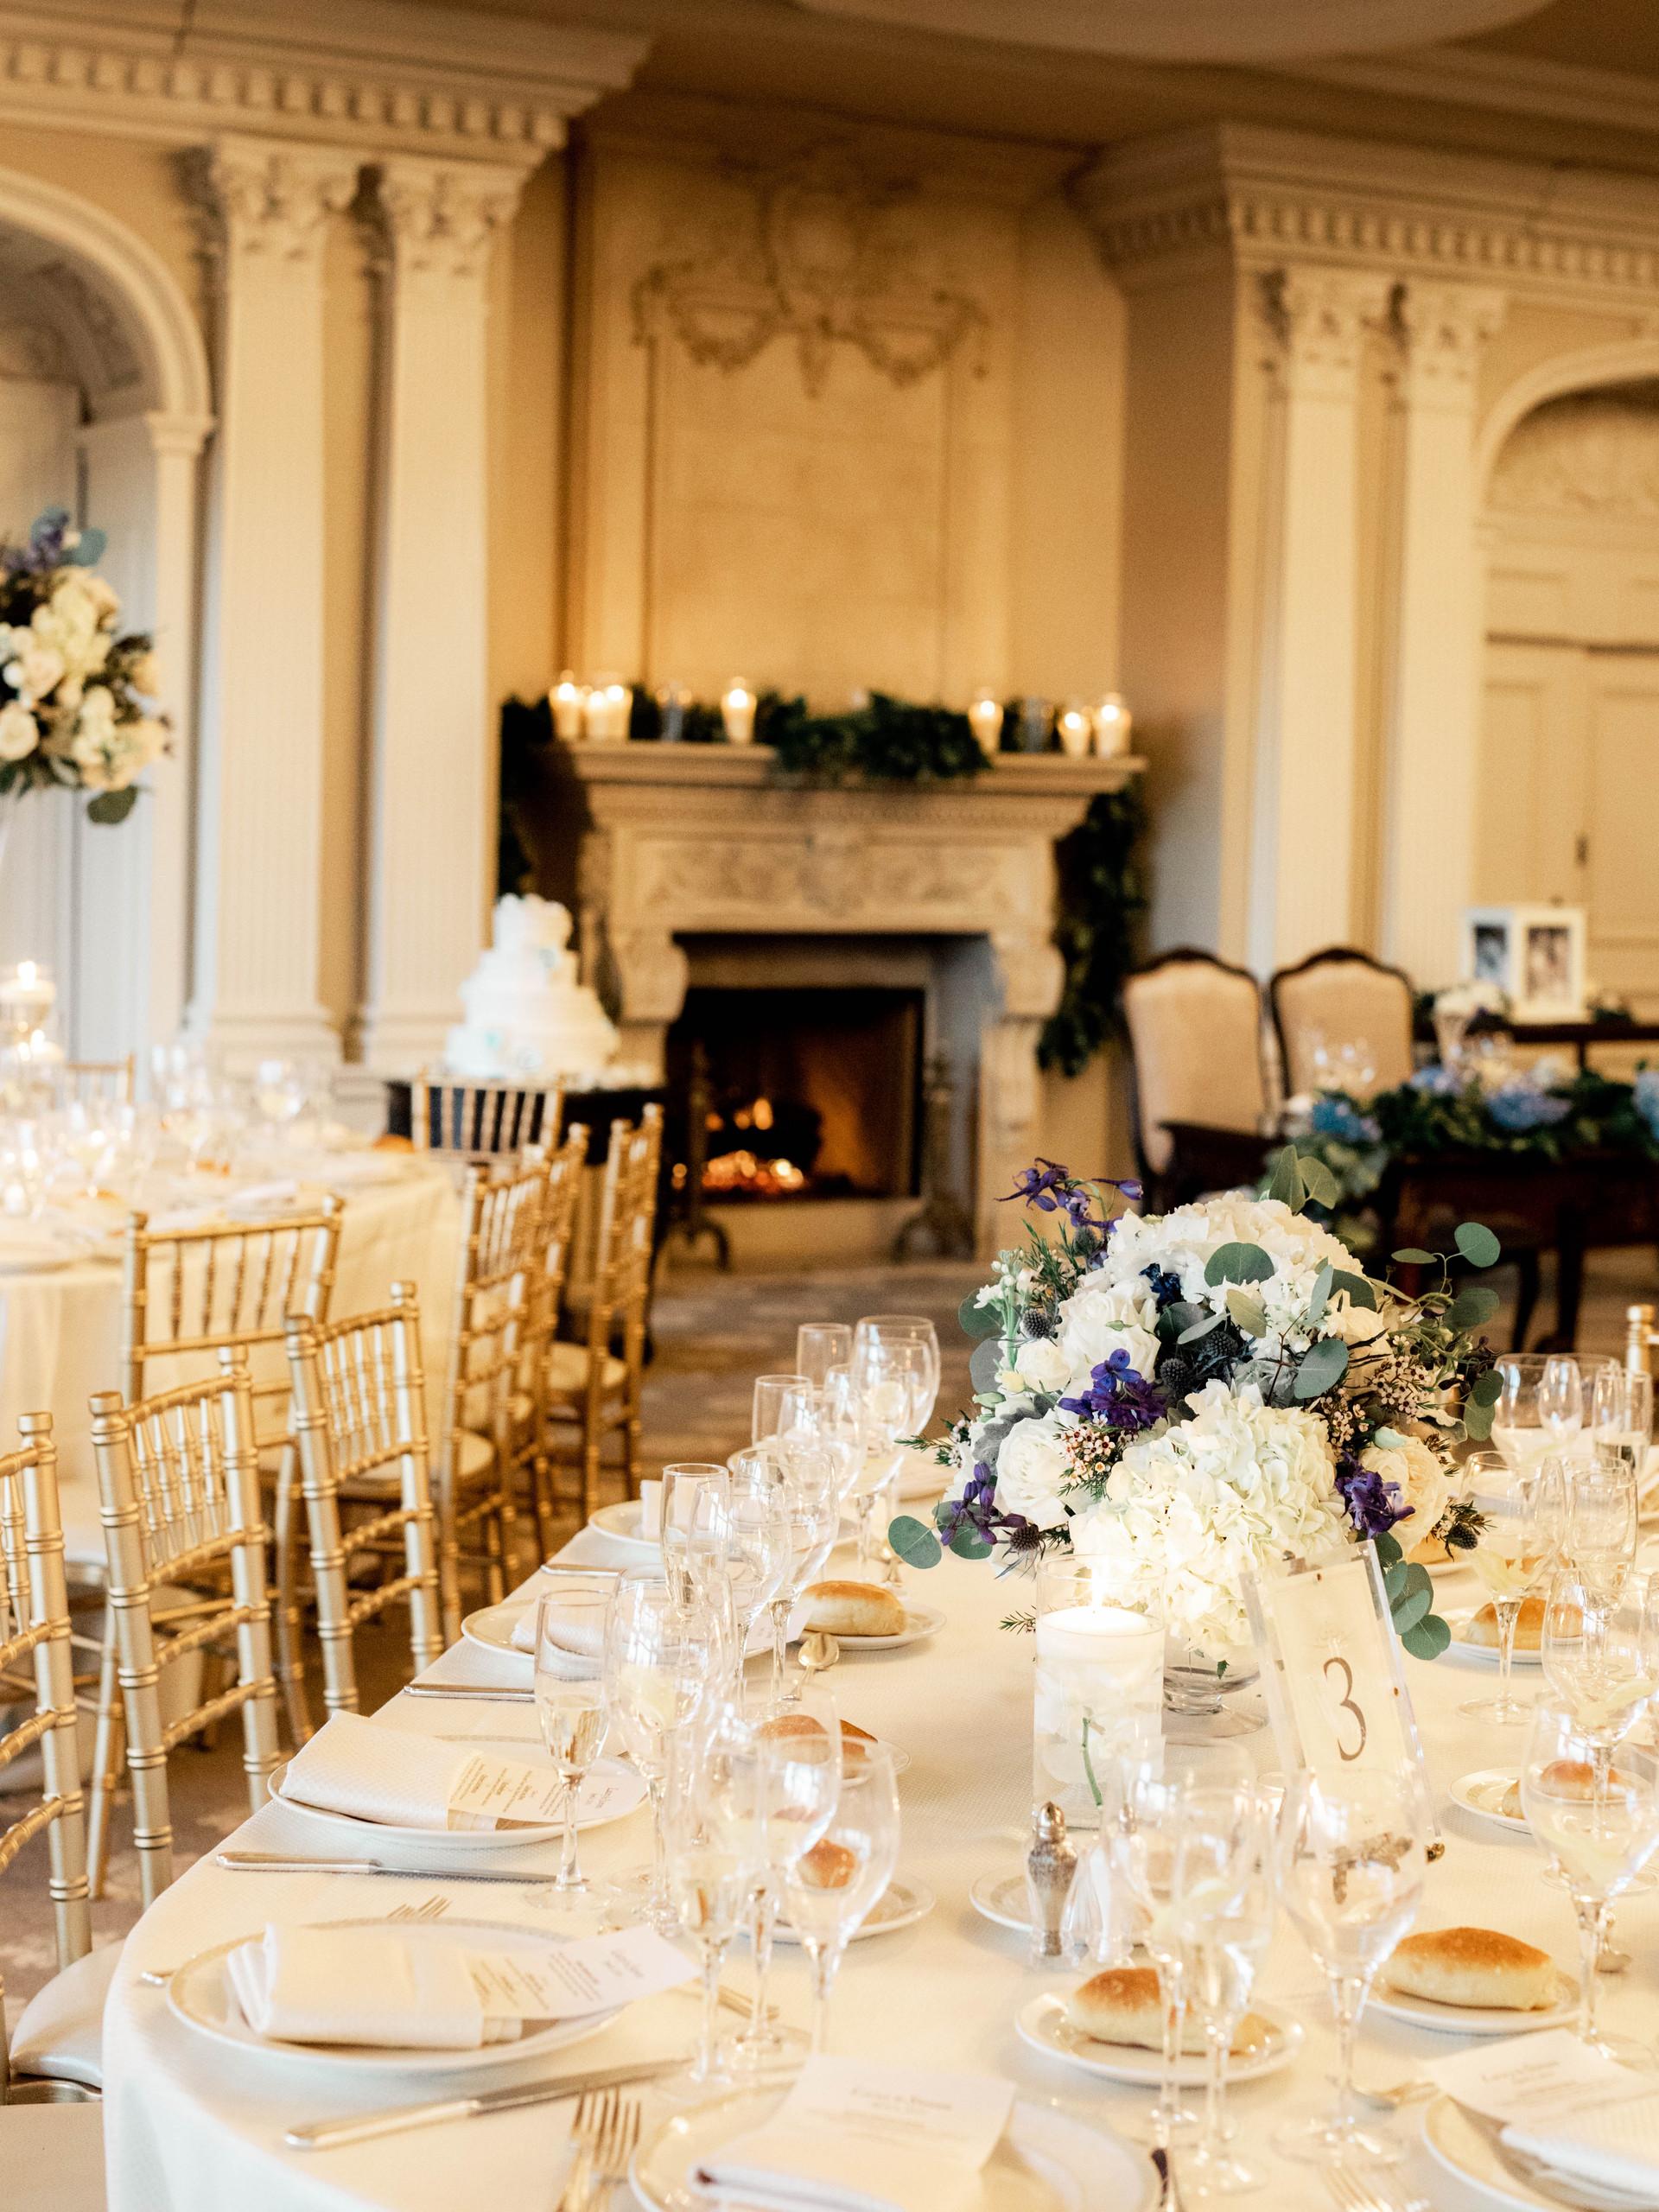 new-jersey-wedding-table-setting-4.jpg